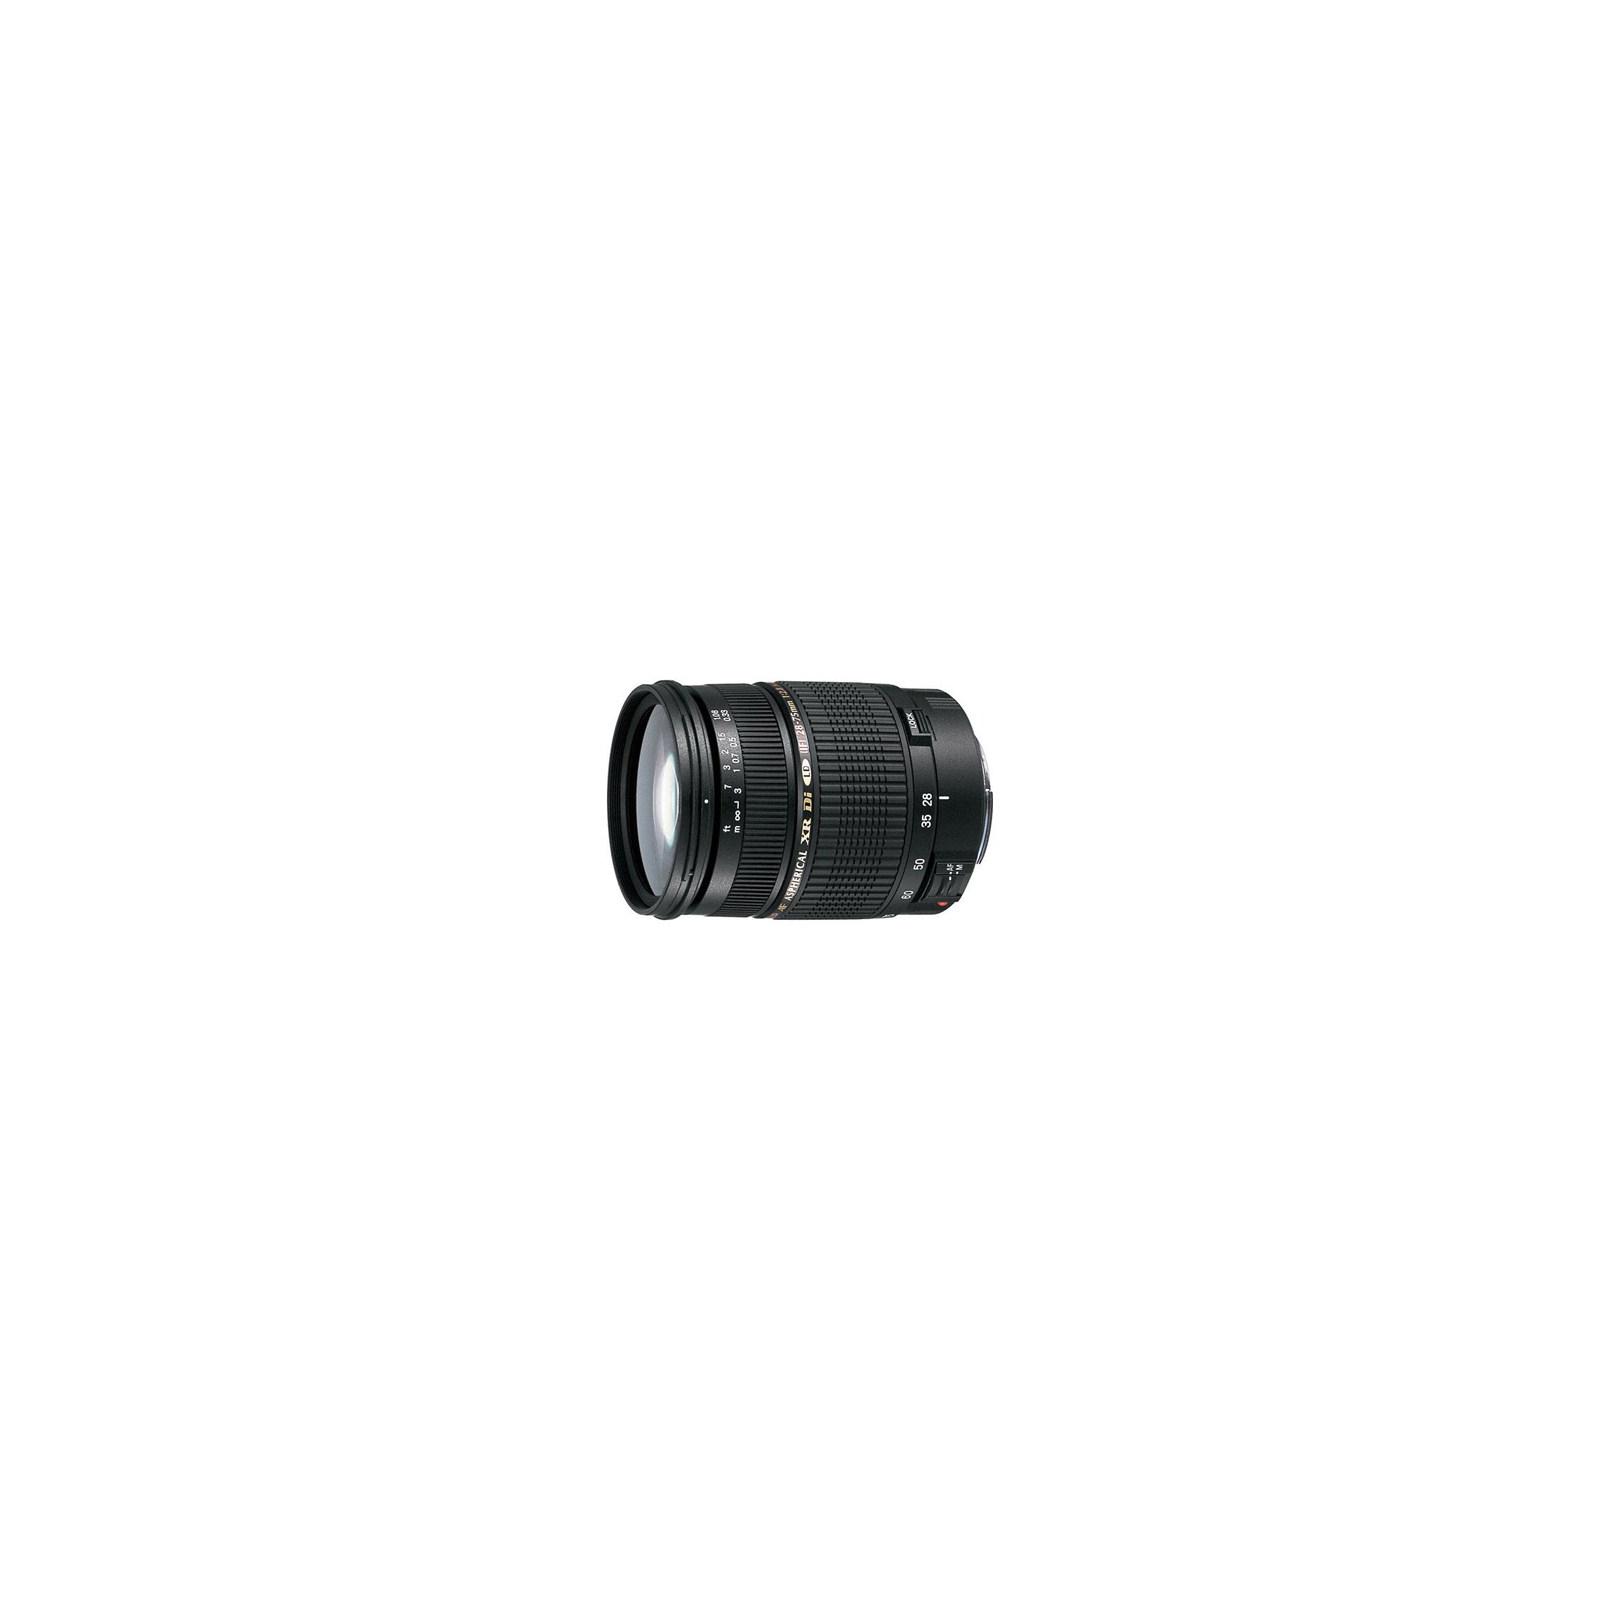 Объектив Tamron AF SP 28-75 f/2.8 Di XR LD Asp. (IF) macro for Nikon (AF 28-75mm for Nikon)